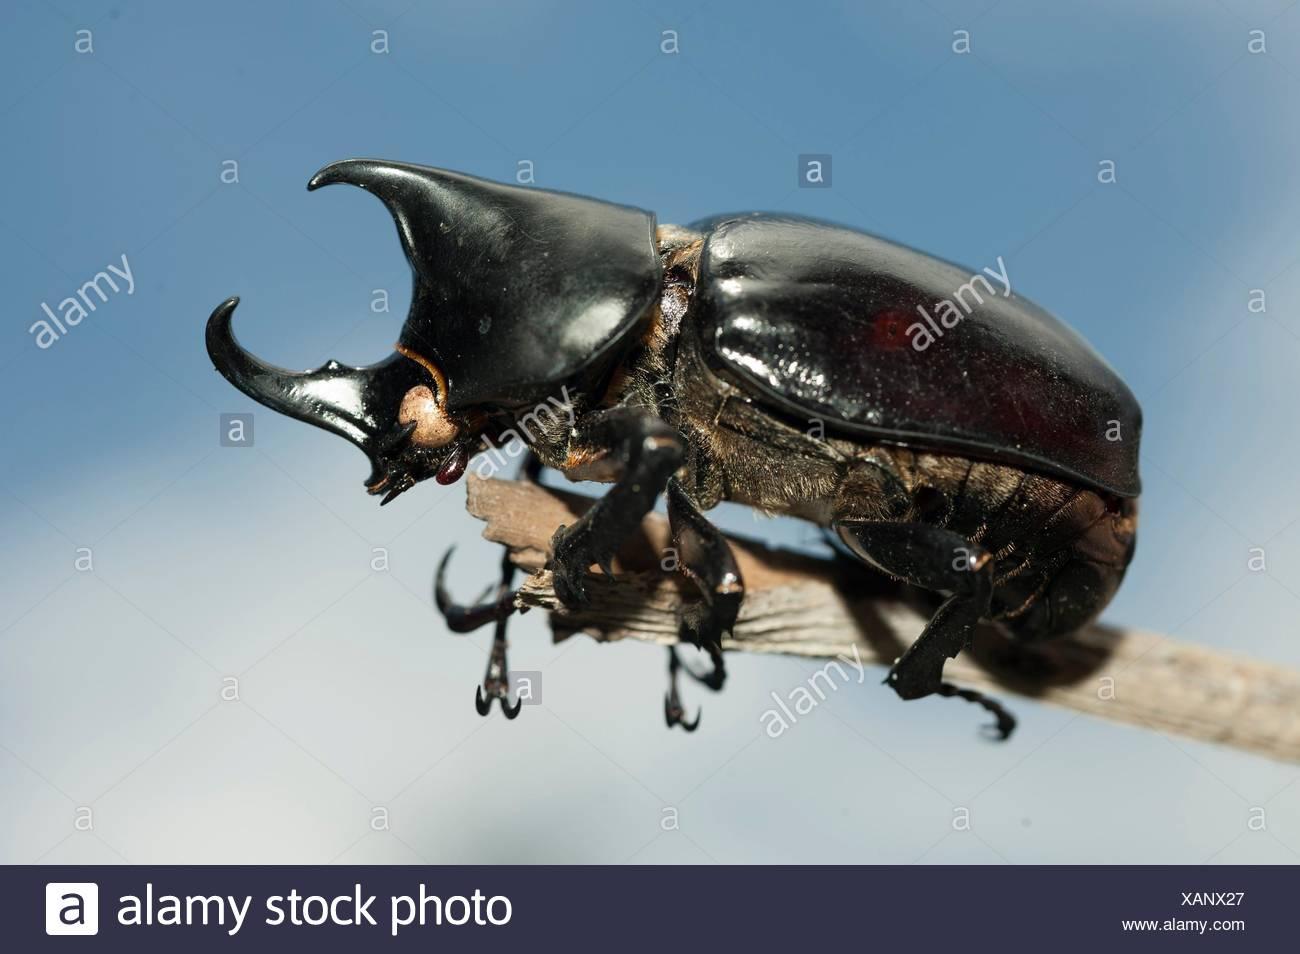 Coconut Palm aka or Asiatic Rhinoceros Beetle (Coleoptera order, Polyphaga suborder, Scarabaeidae family, Dynastinae sub-family) on twig, Klungkung, Stock Photo